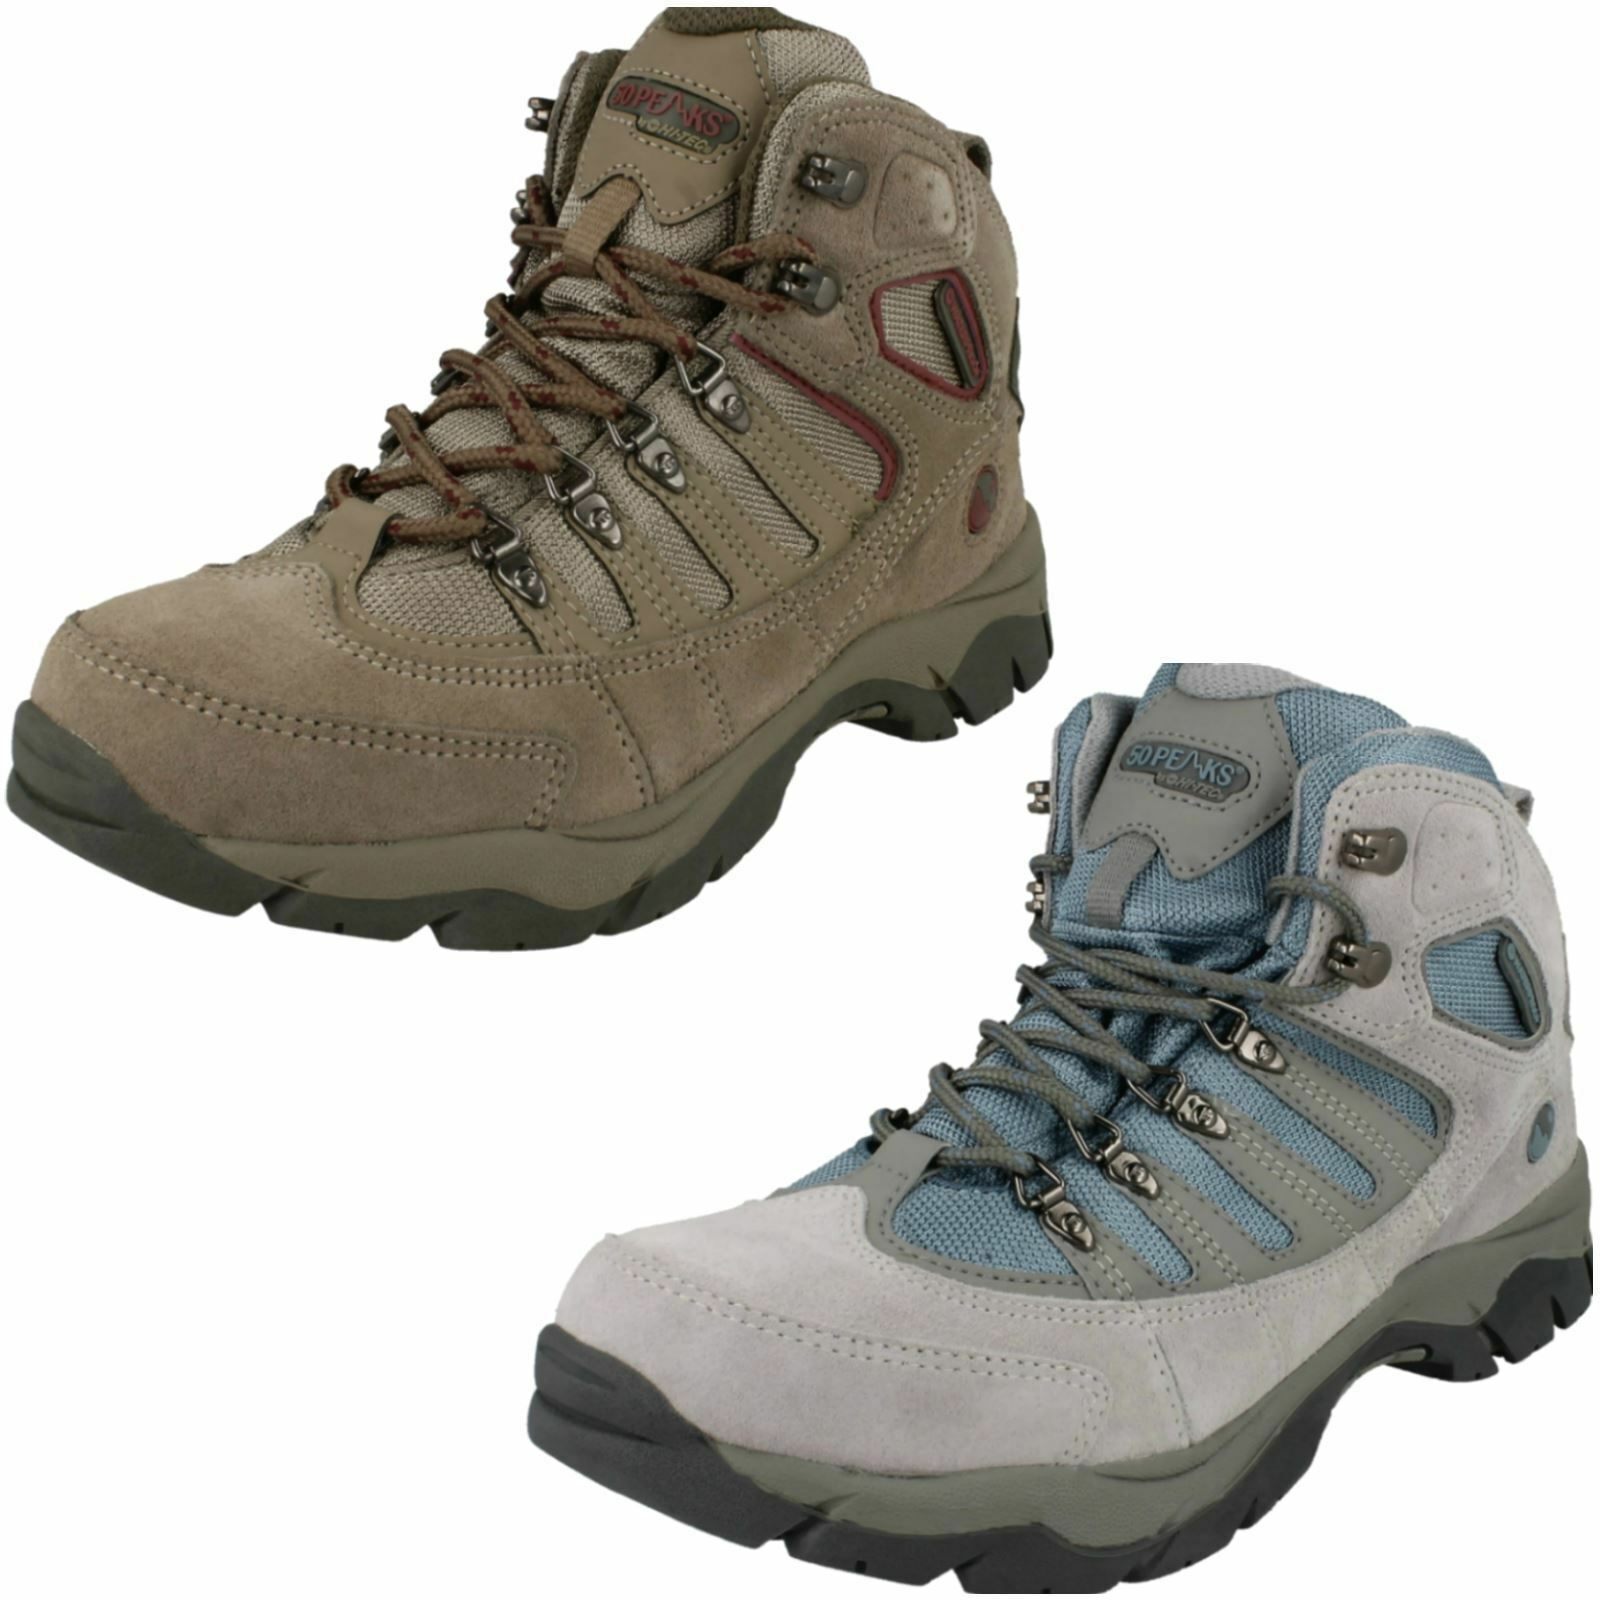 Womens Hi-Tec Waterproof Boots - Mc kinley WP WS